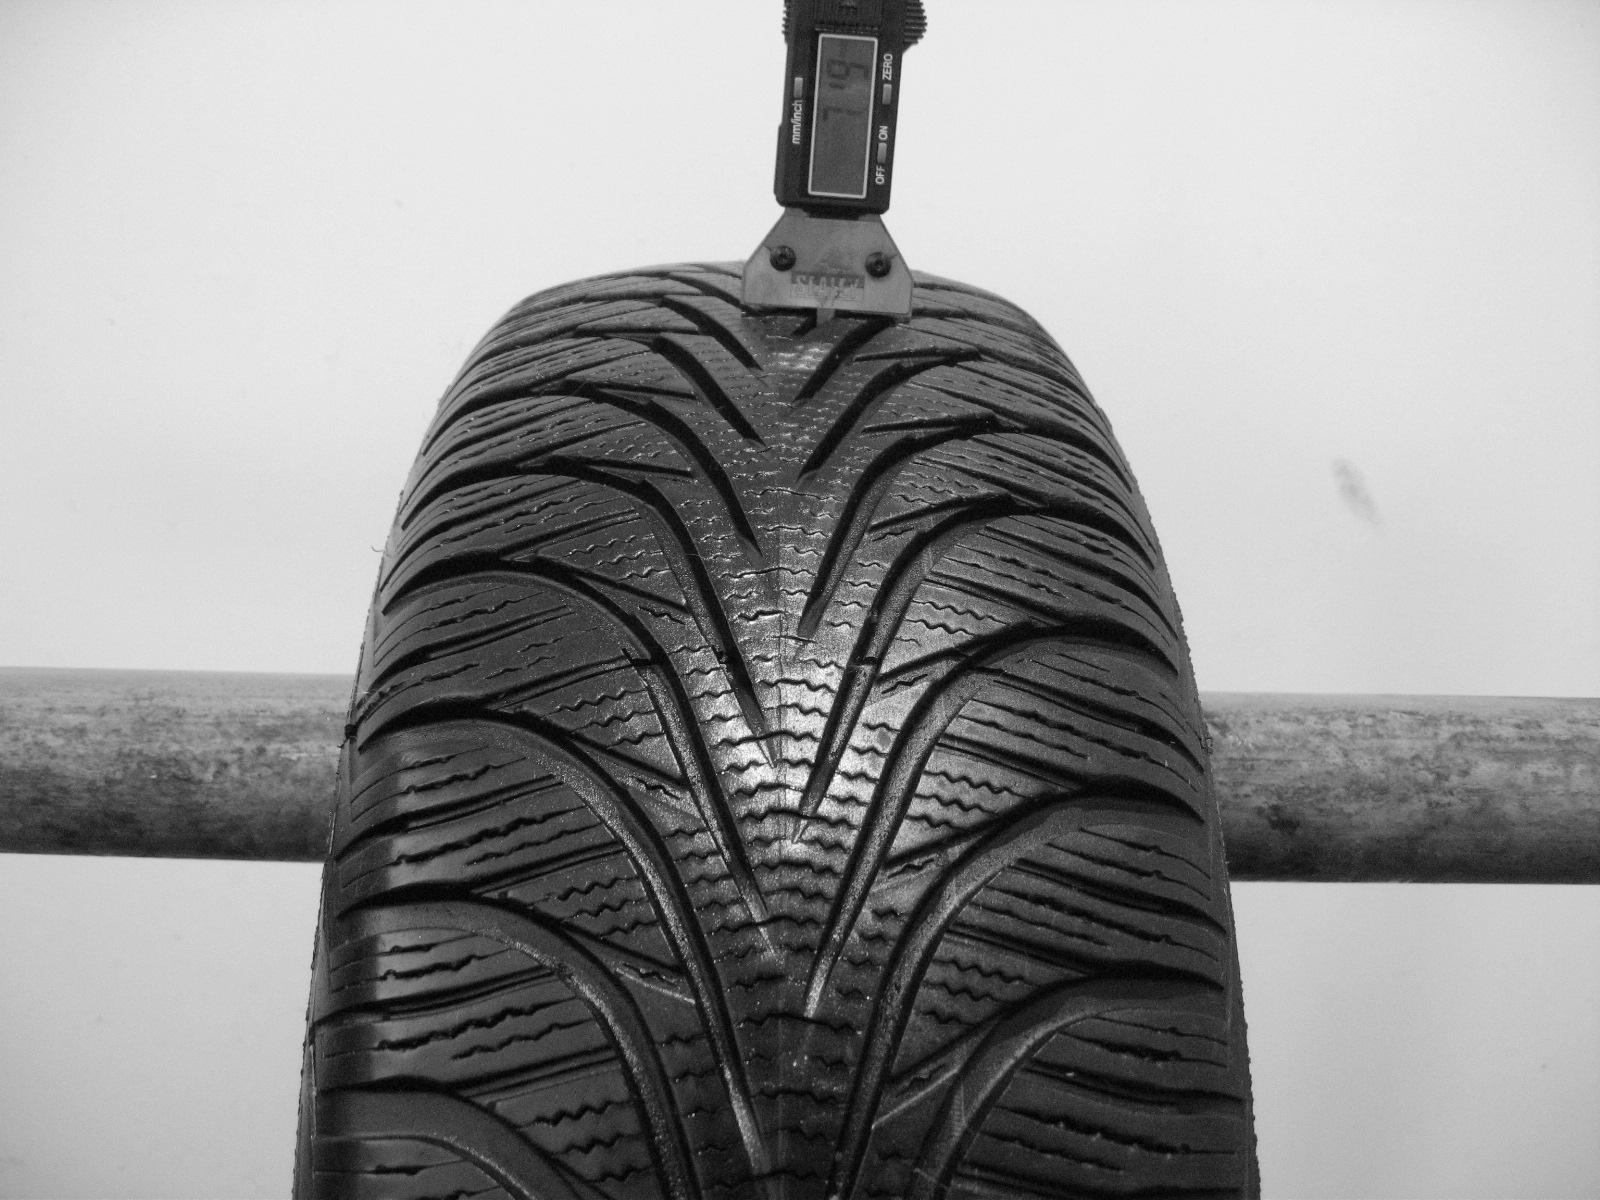 Použité-Pneu-Bazar - 195/65 R15 GOODYEAR ULTRAGRIP 6 -kusovka-rezerva 3mm